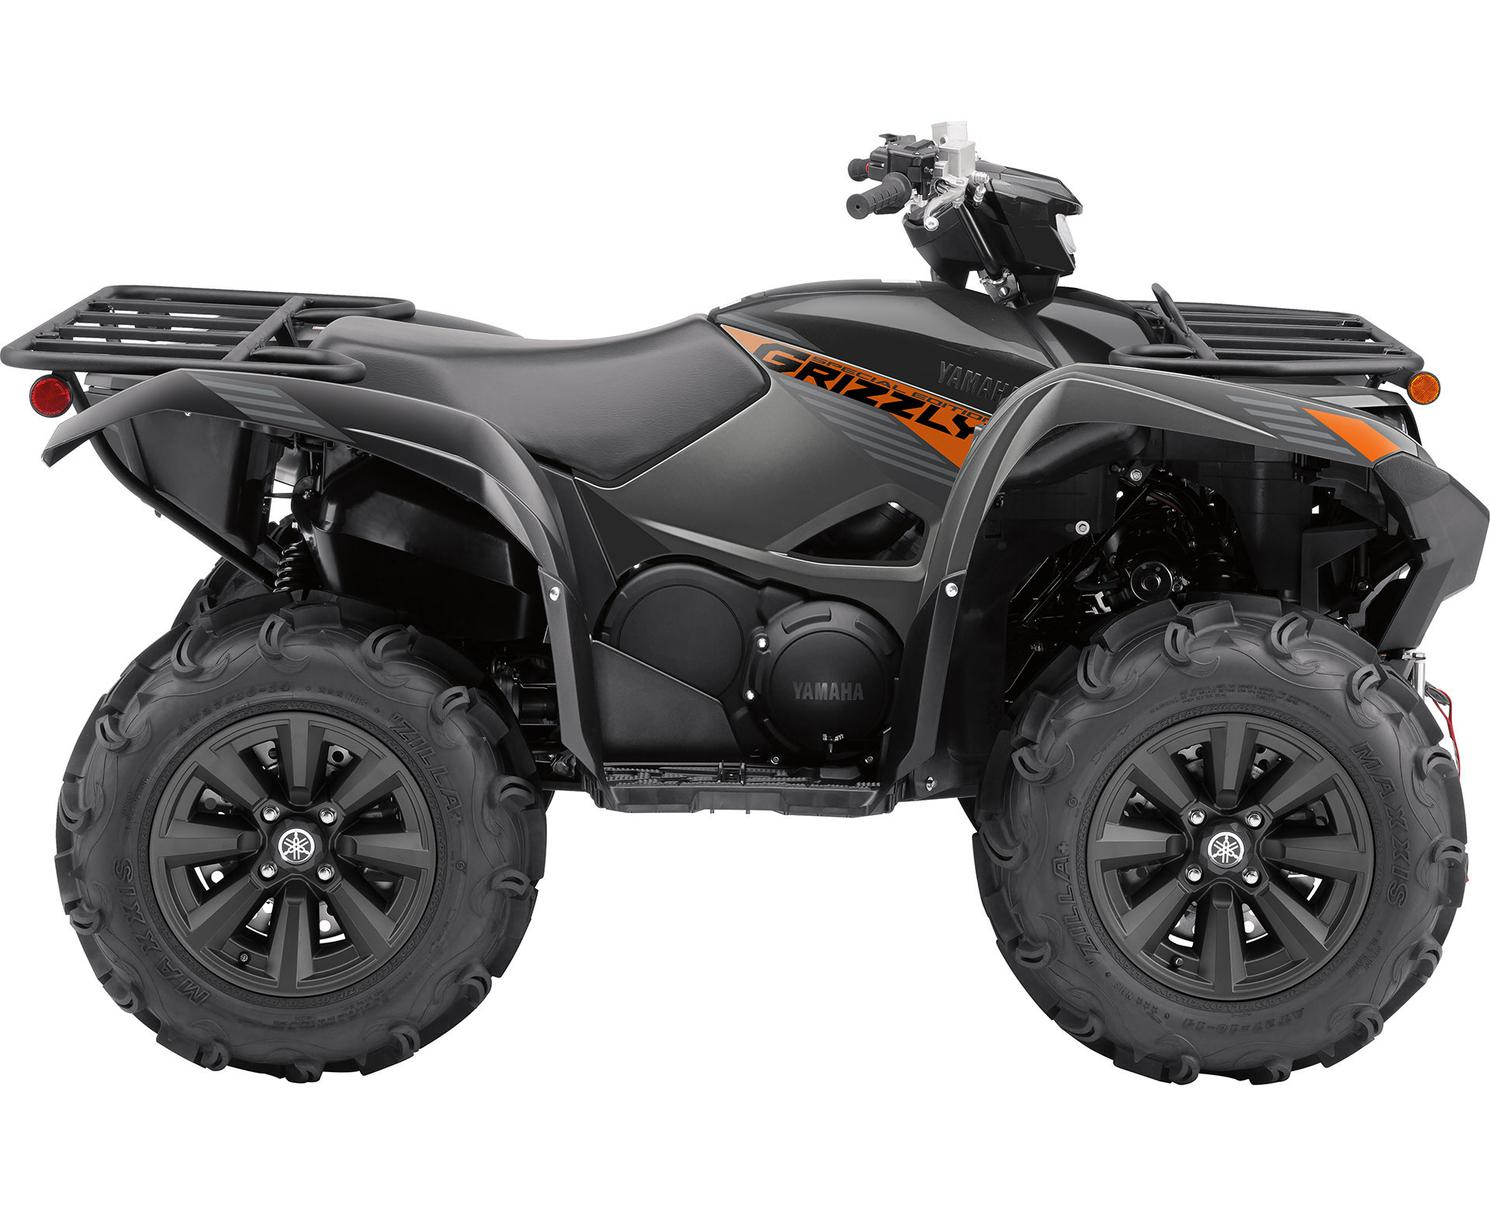 2021 Yamaha Grizzly 700 DAE SE